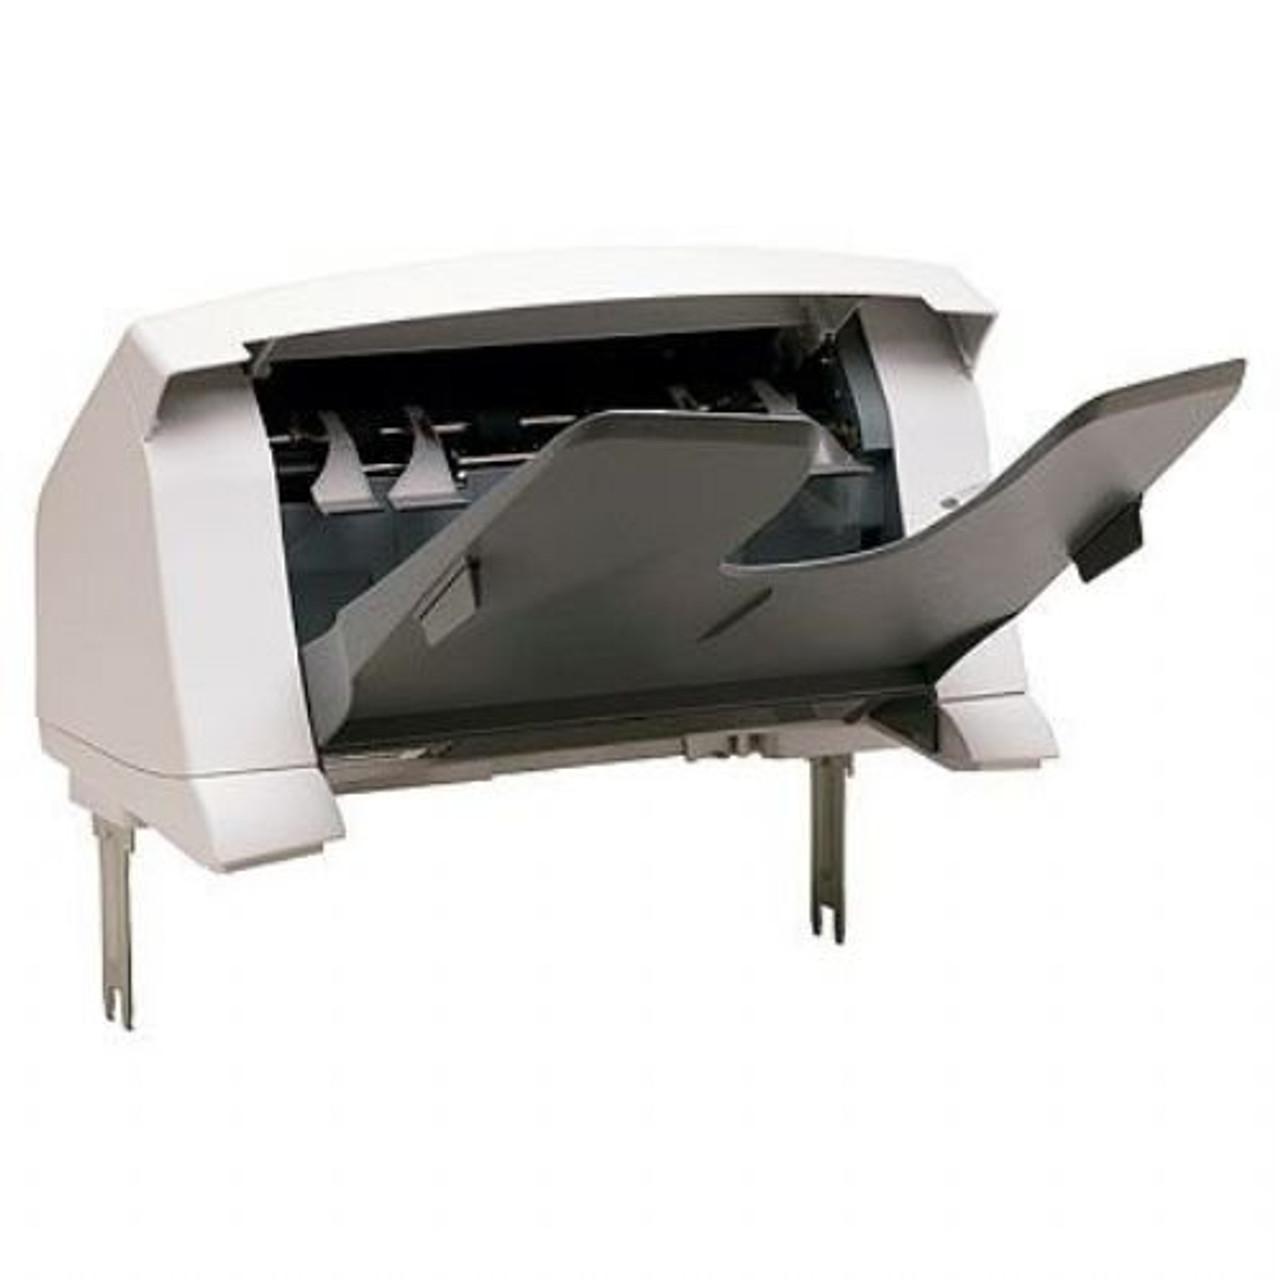 500 Sheet Stacker for HP LaserJet 4200 4300